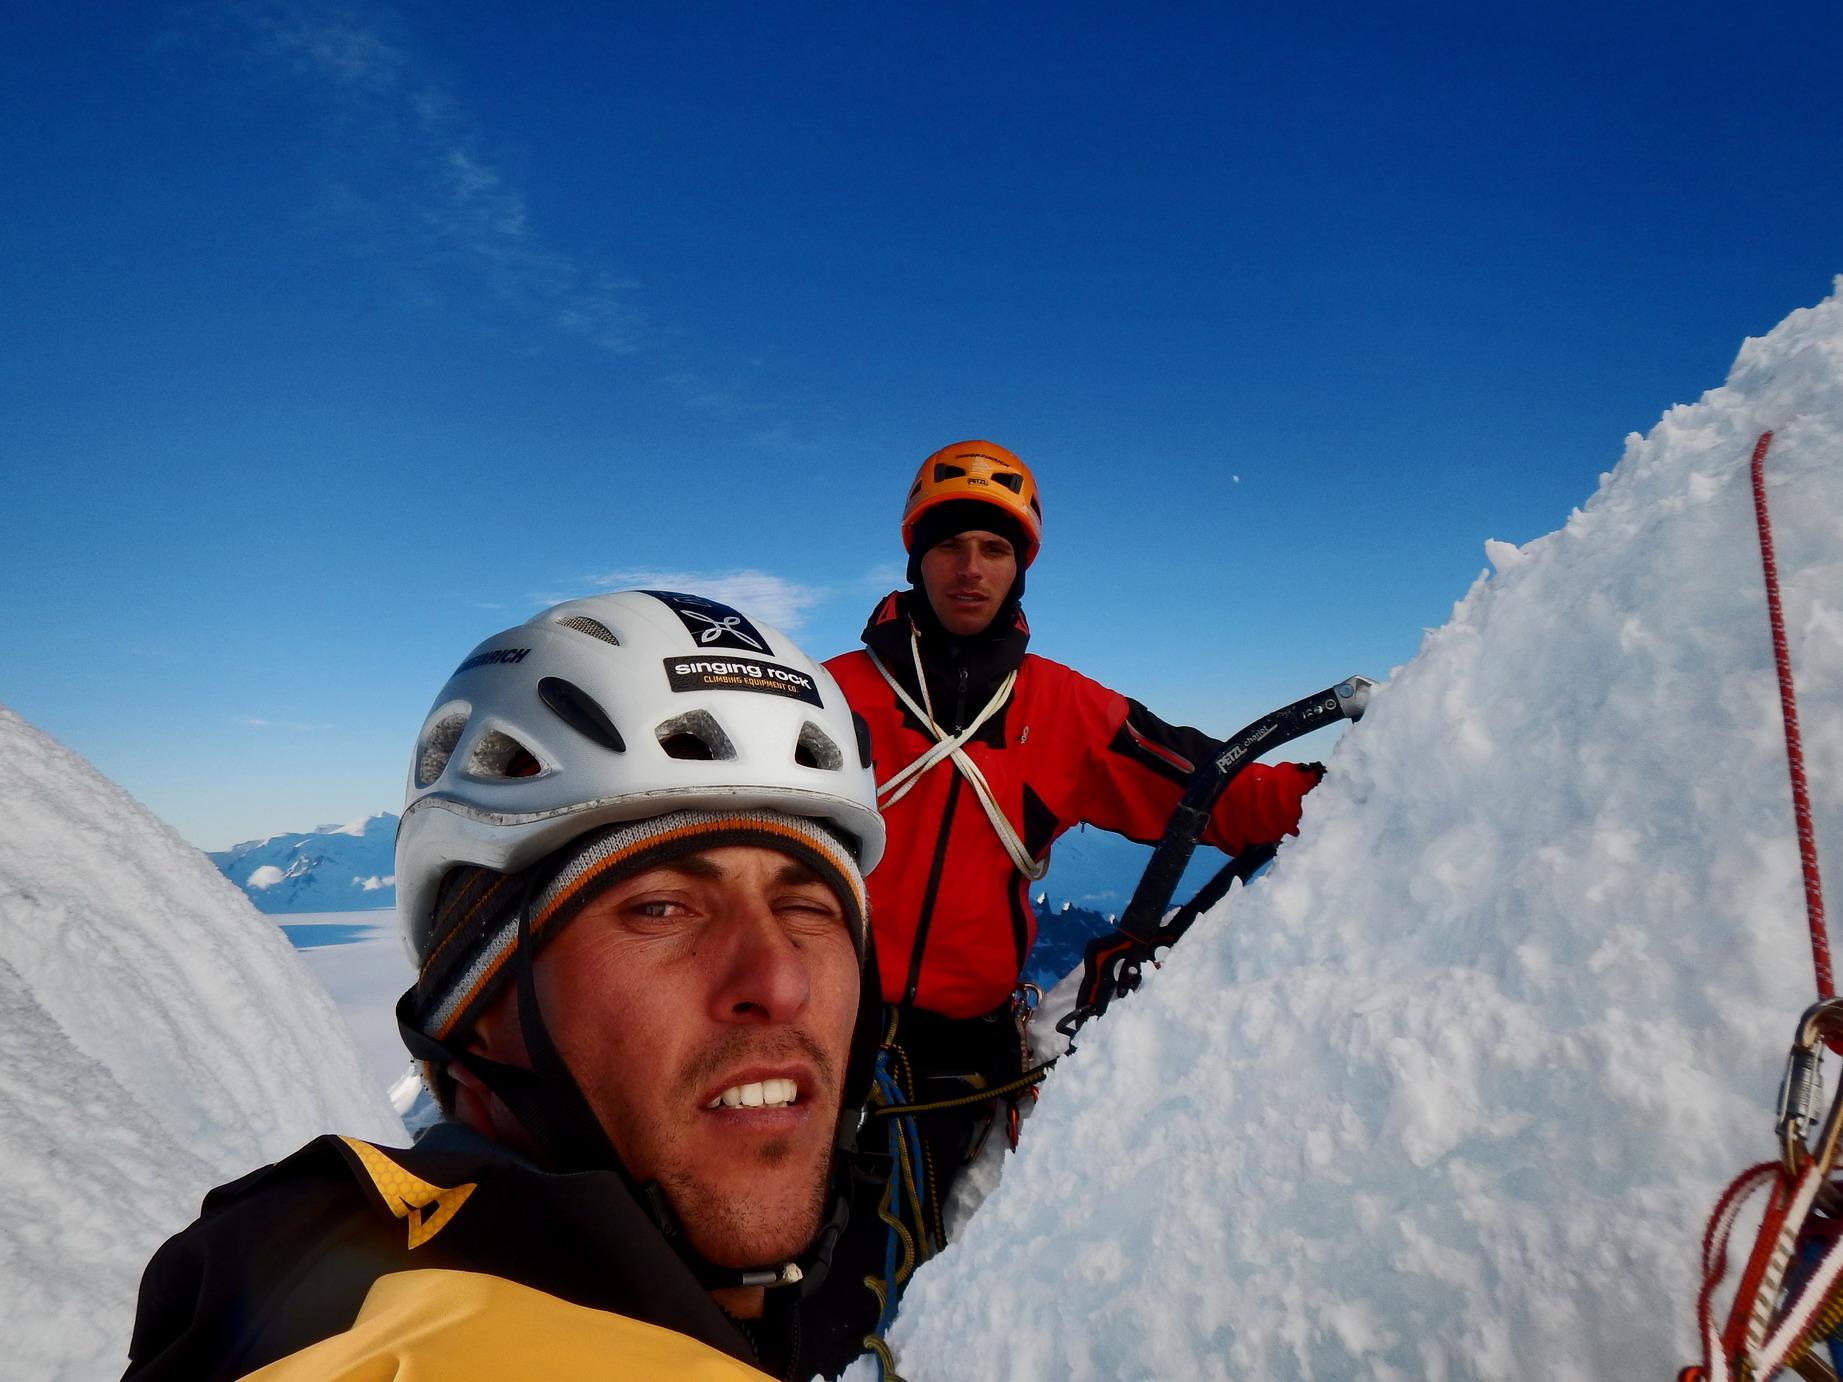 deset metrov pod vrhom Cerro Torreja